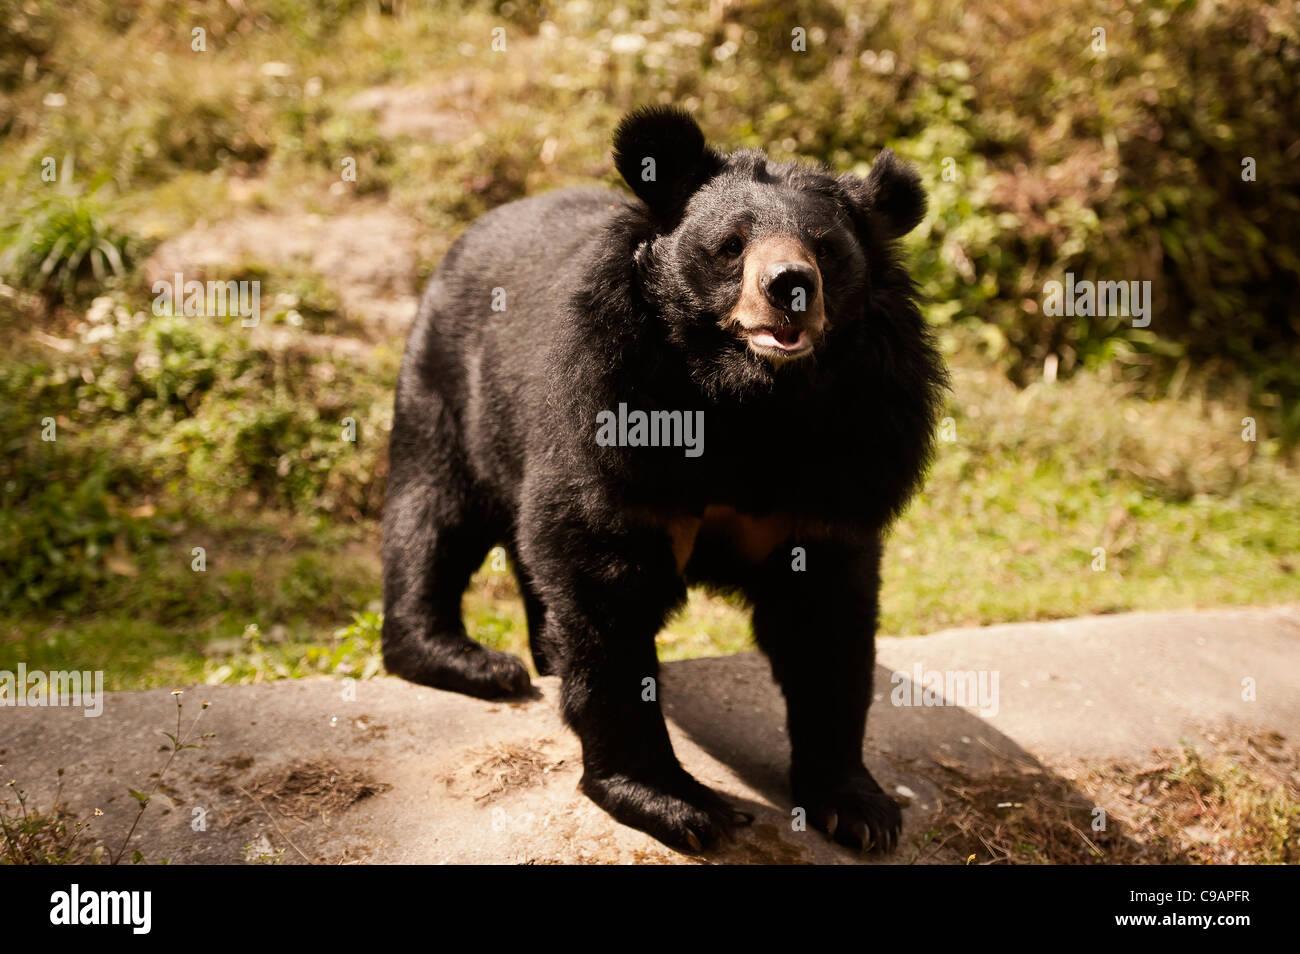 Charging bear, before,final,assault. - Stock Image